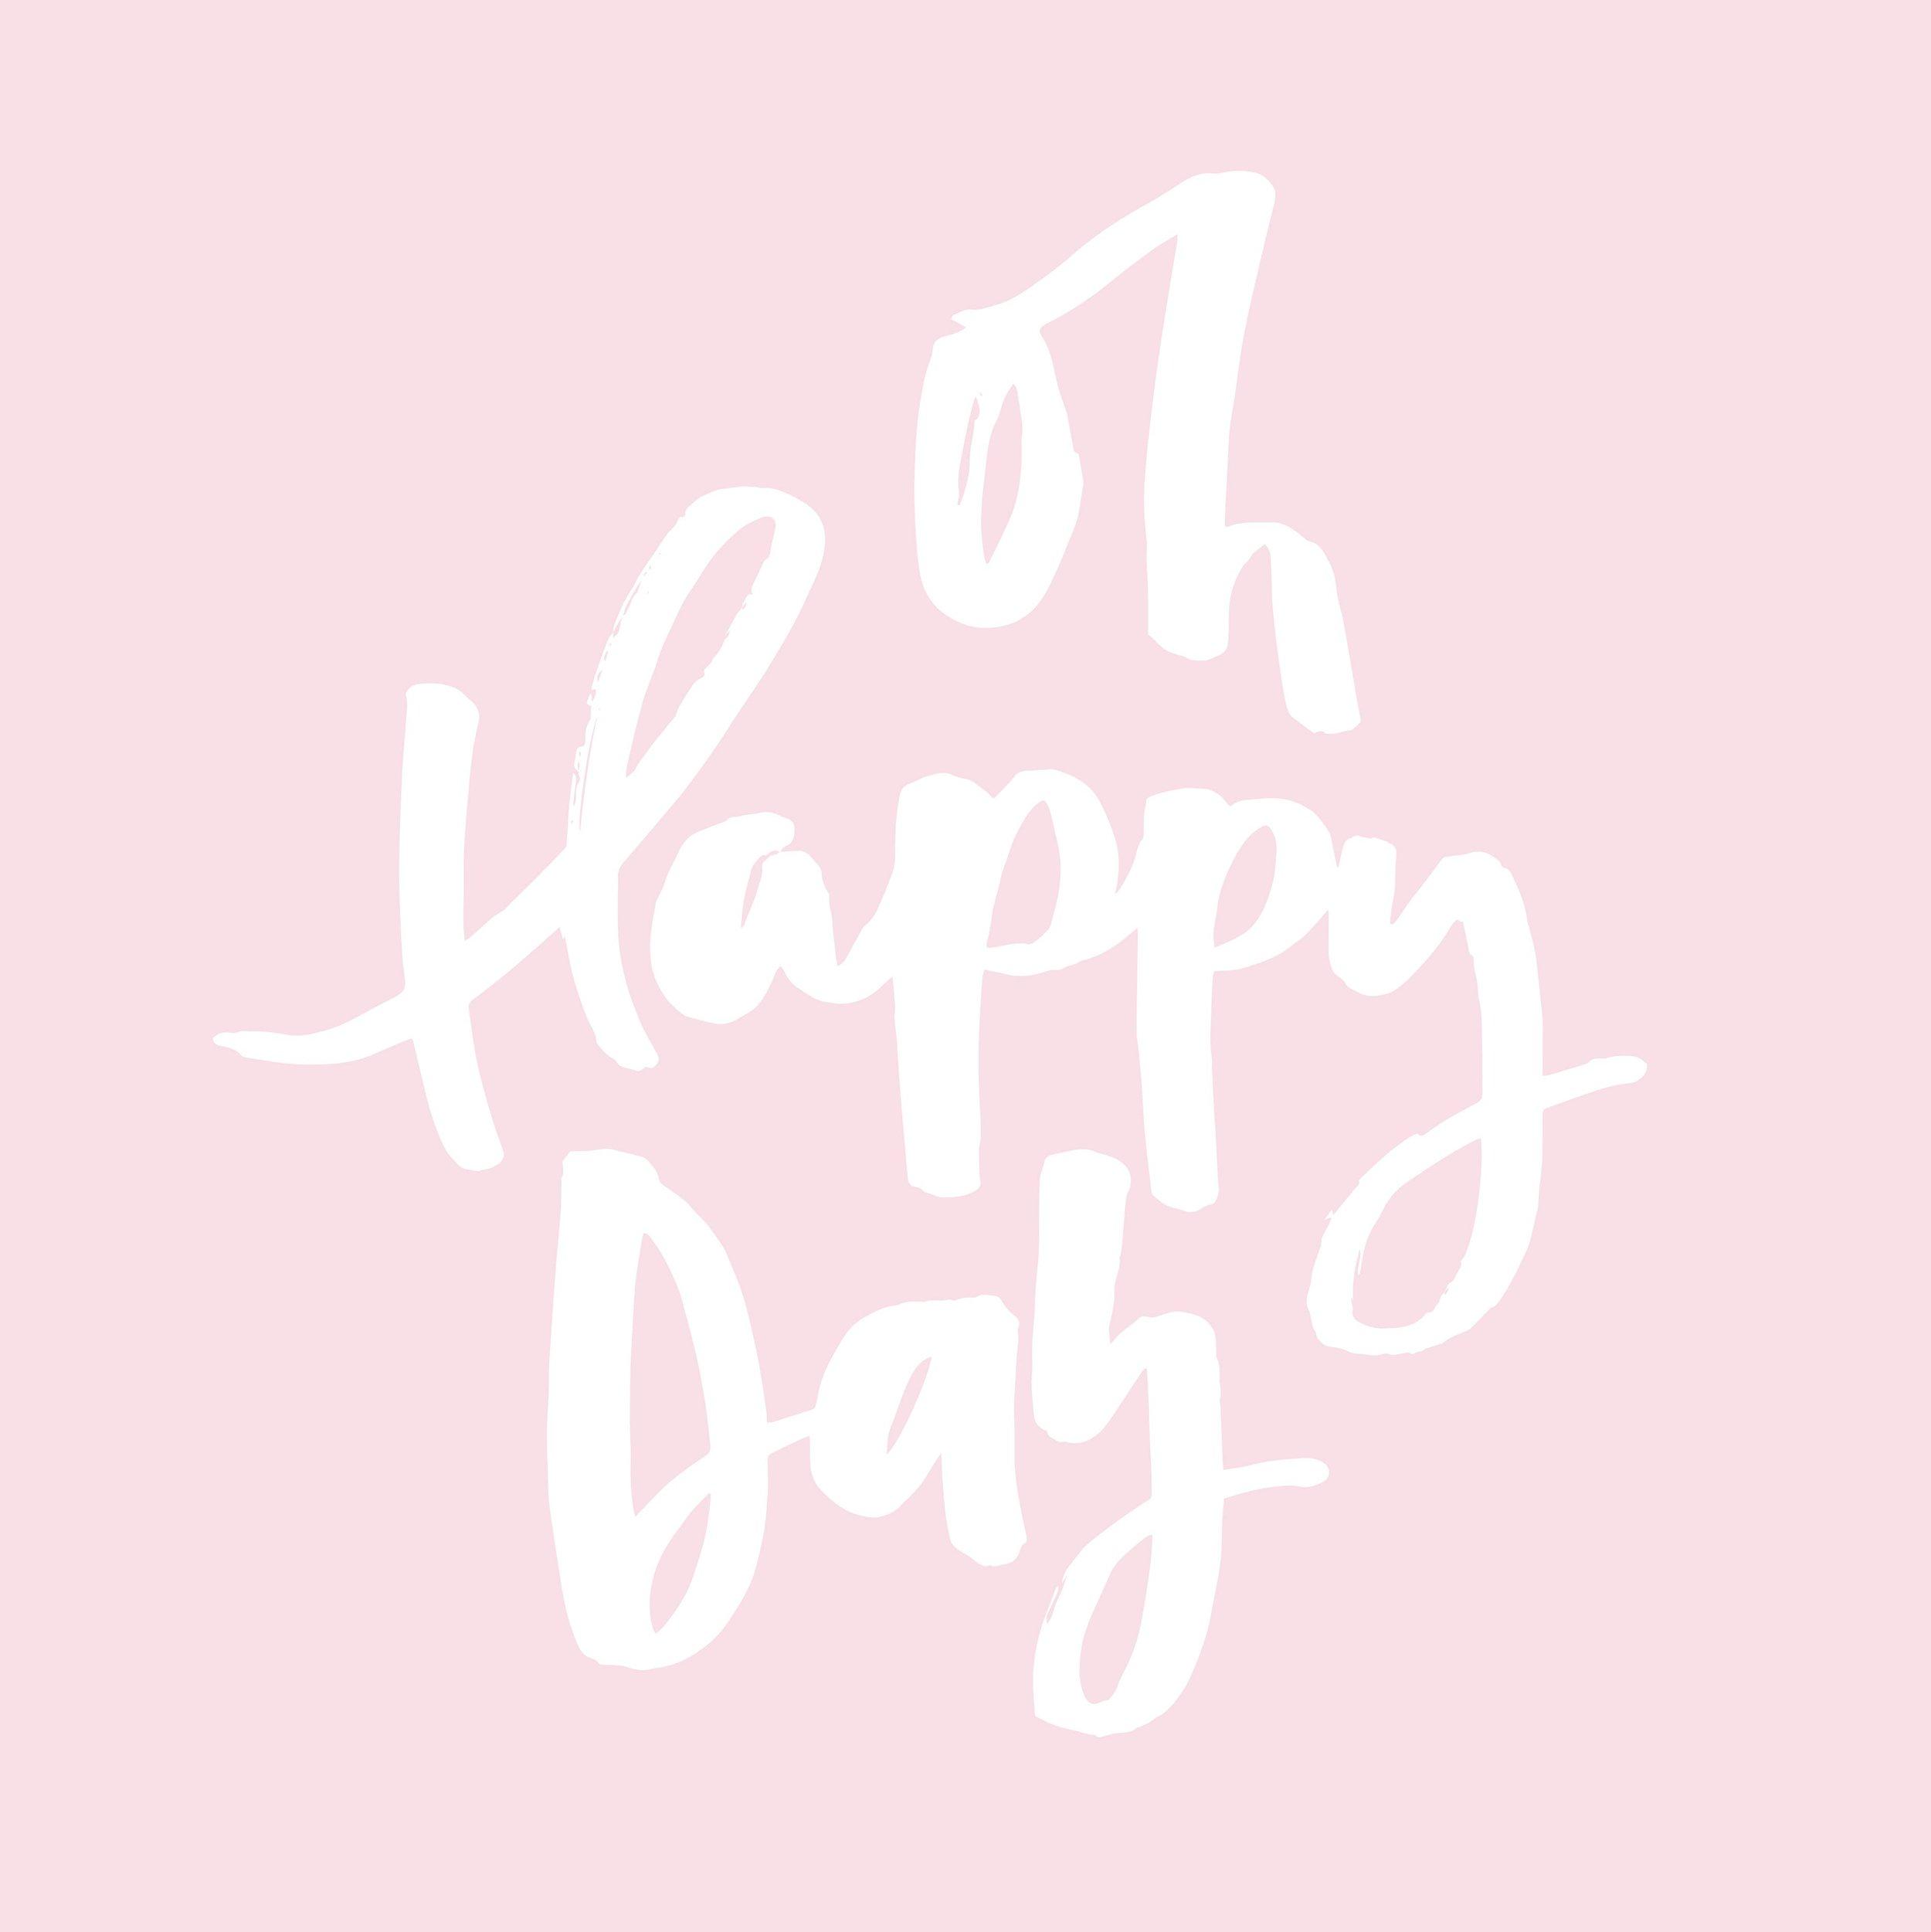 happyday.jpg